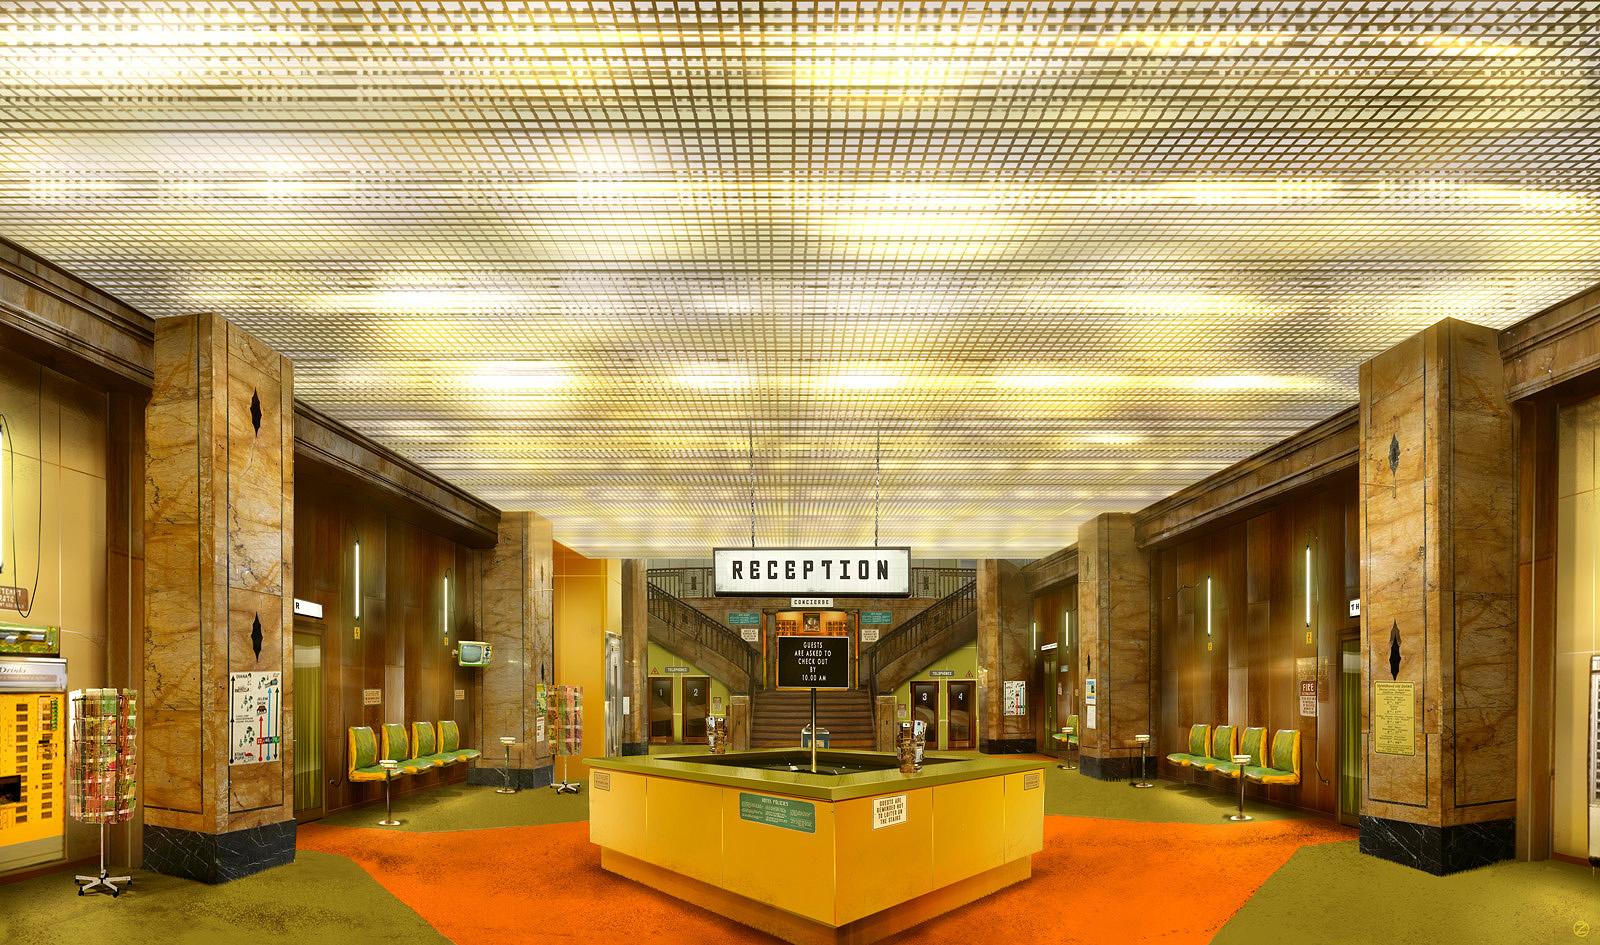 Ulrich zeidler designer agd the grand budapest hotel for Design apartment 2 budapest